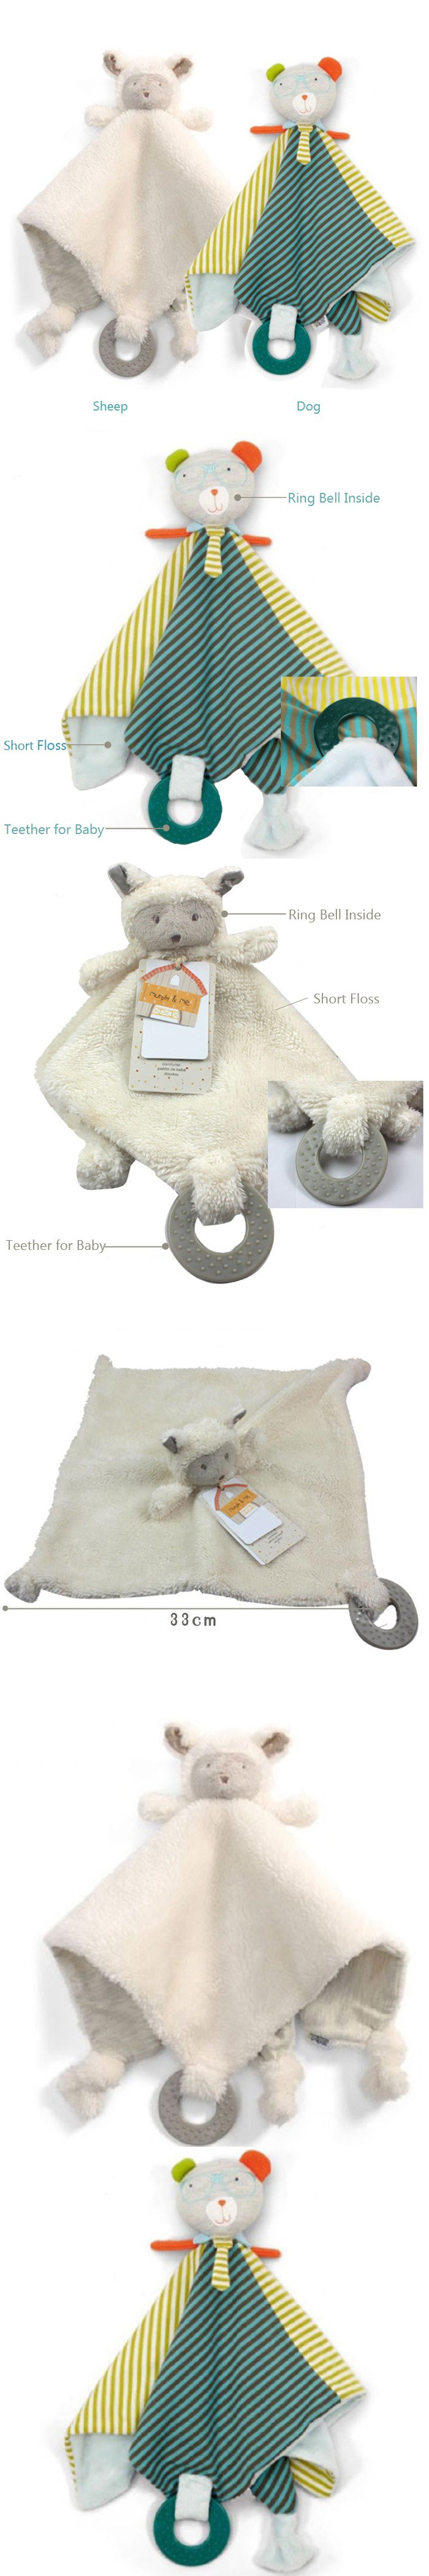 Baby toys images cartoon  New pc Baby Calm Toy Cute Cartoon Animal Soft Plush Handkerchief